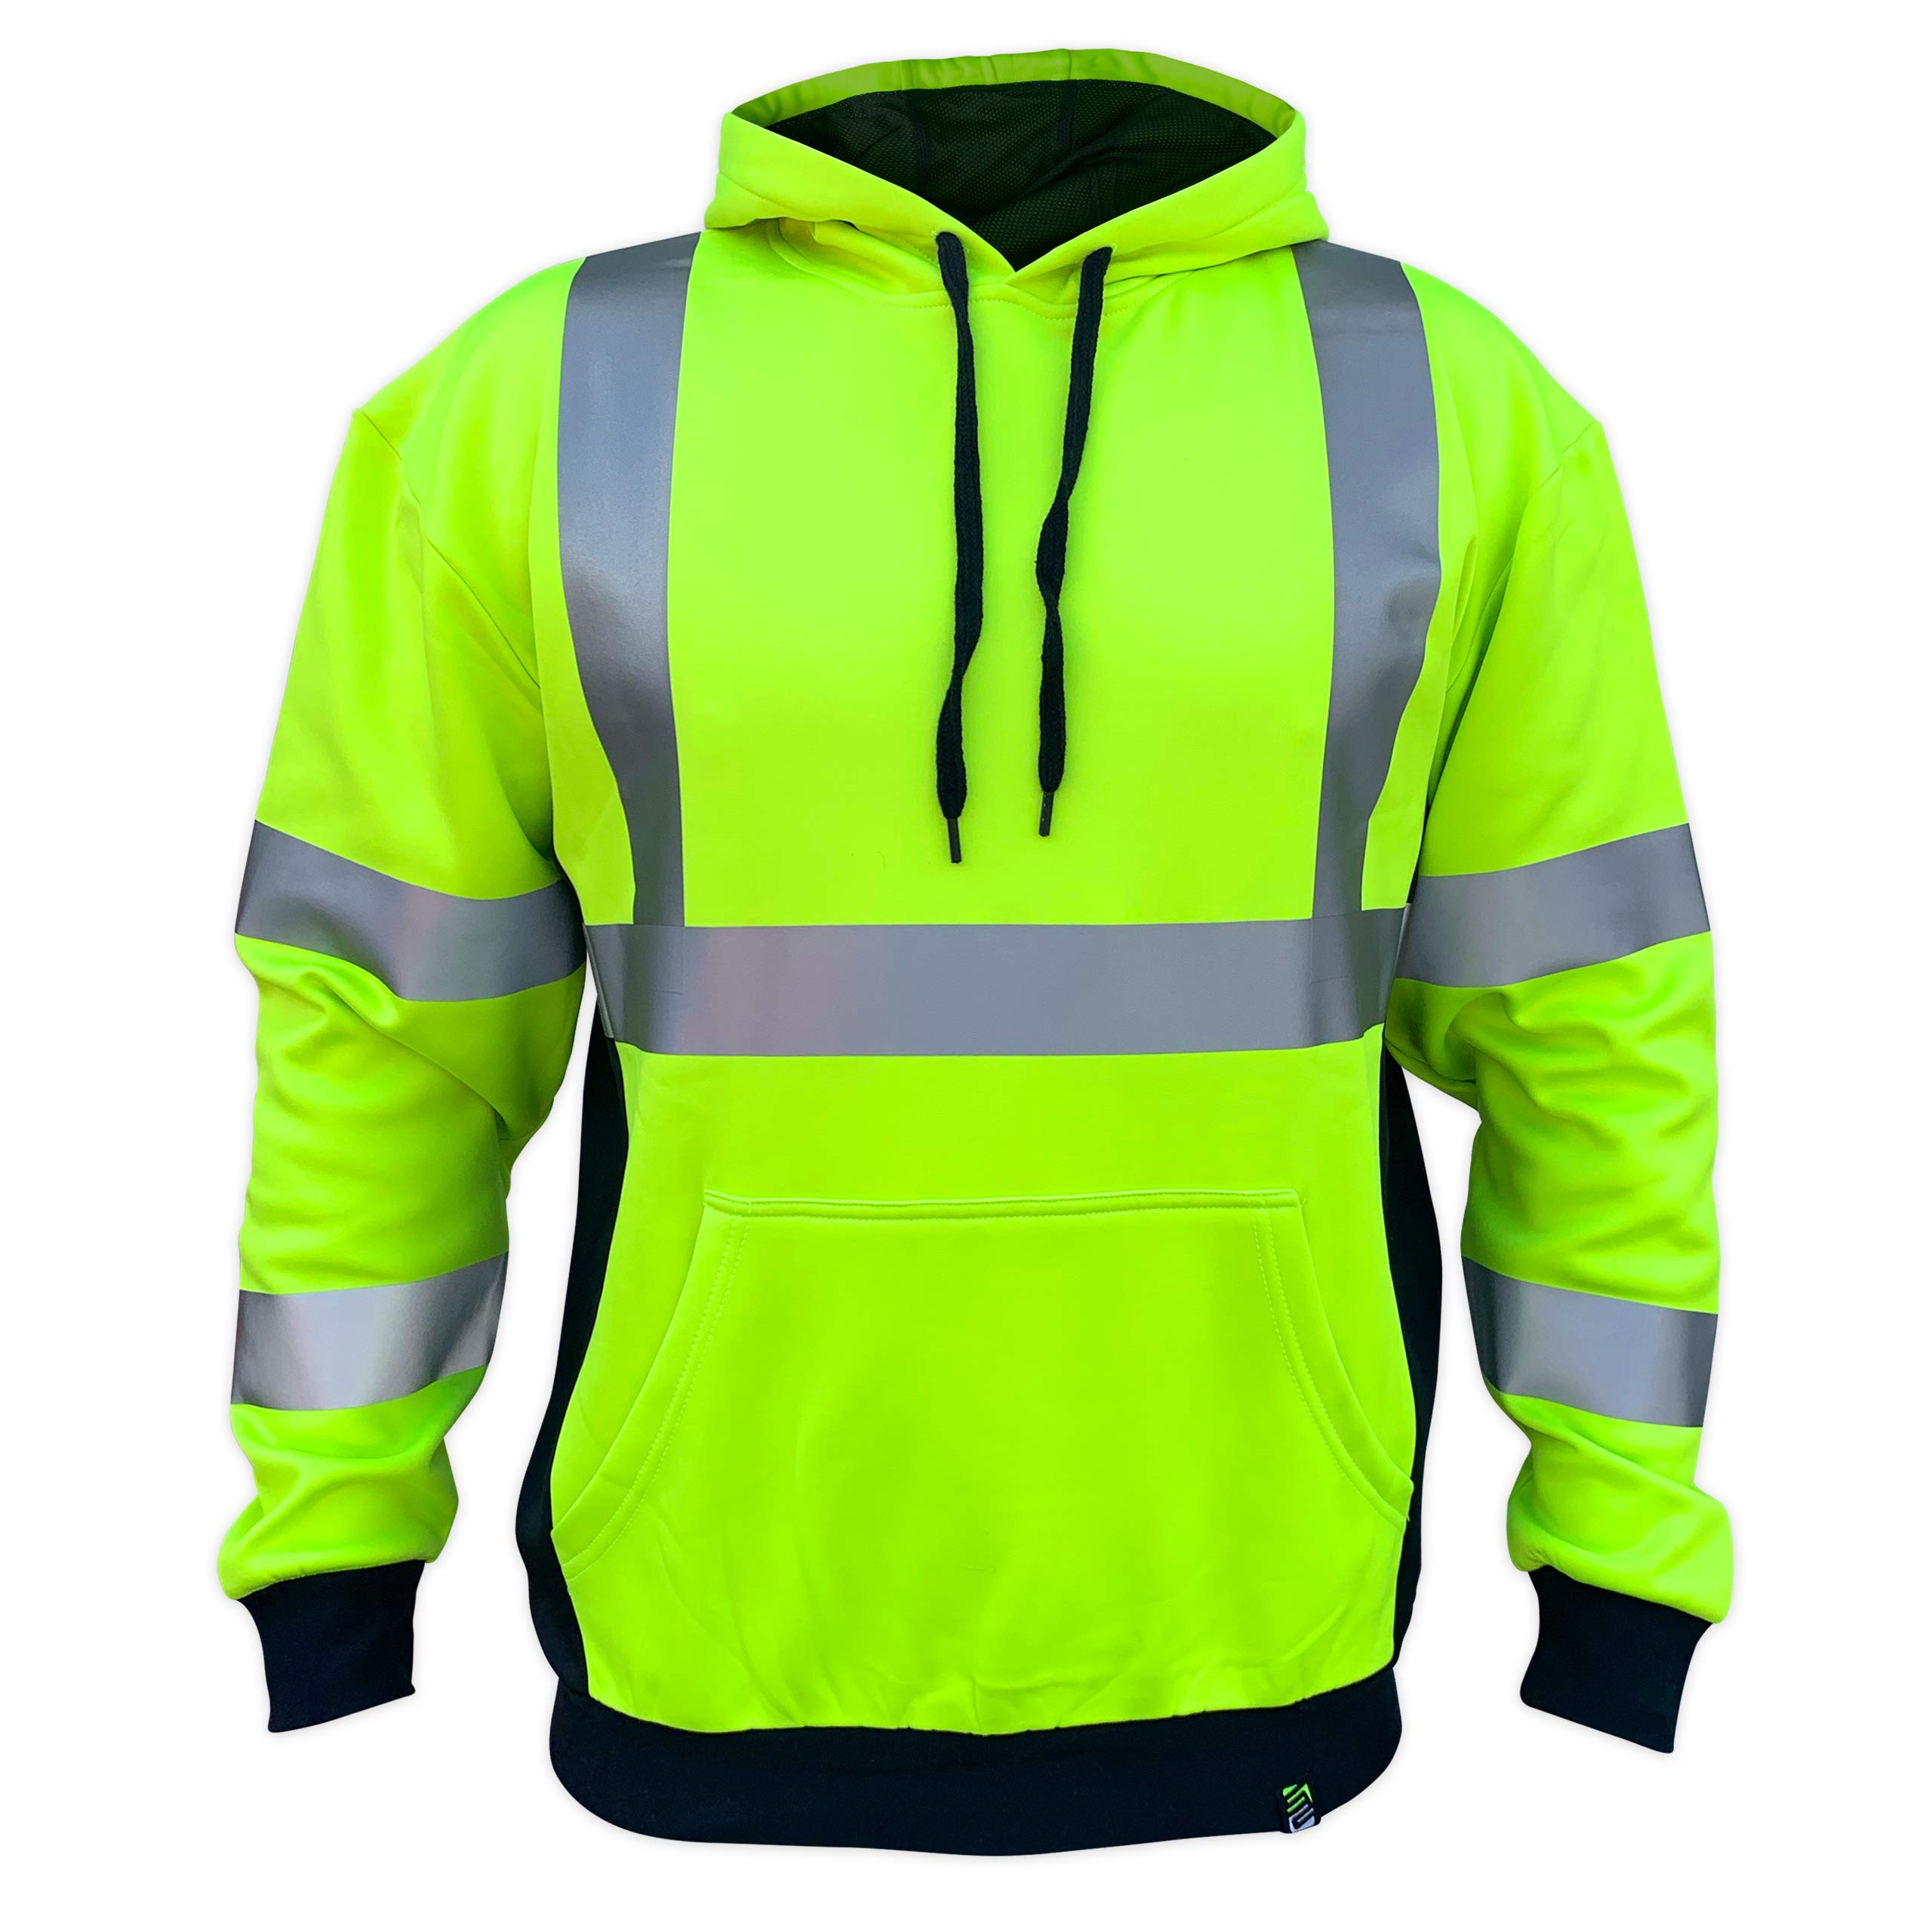 SafetyShirtz SS360 ANSI Class 3 Safety Hoodie Yellow (Safety Green) 4XL by SafetyShirtz